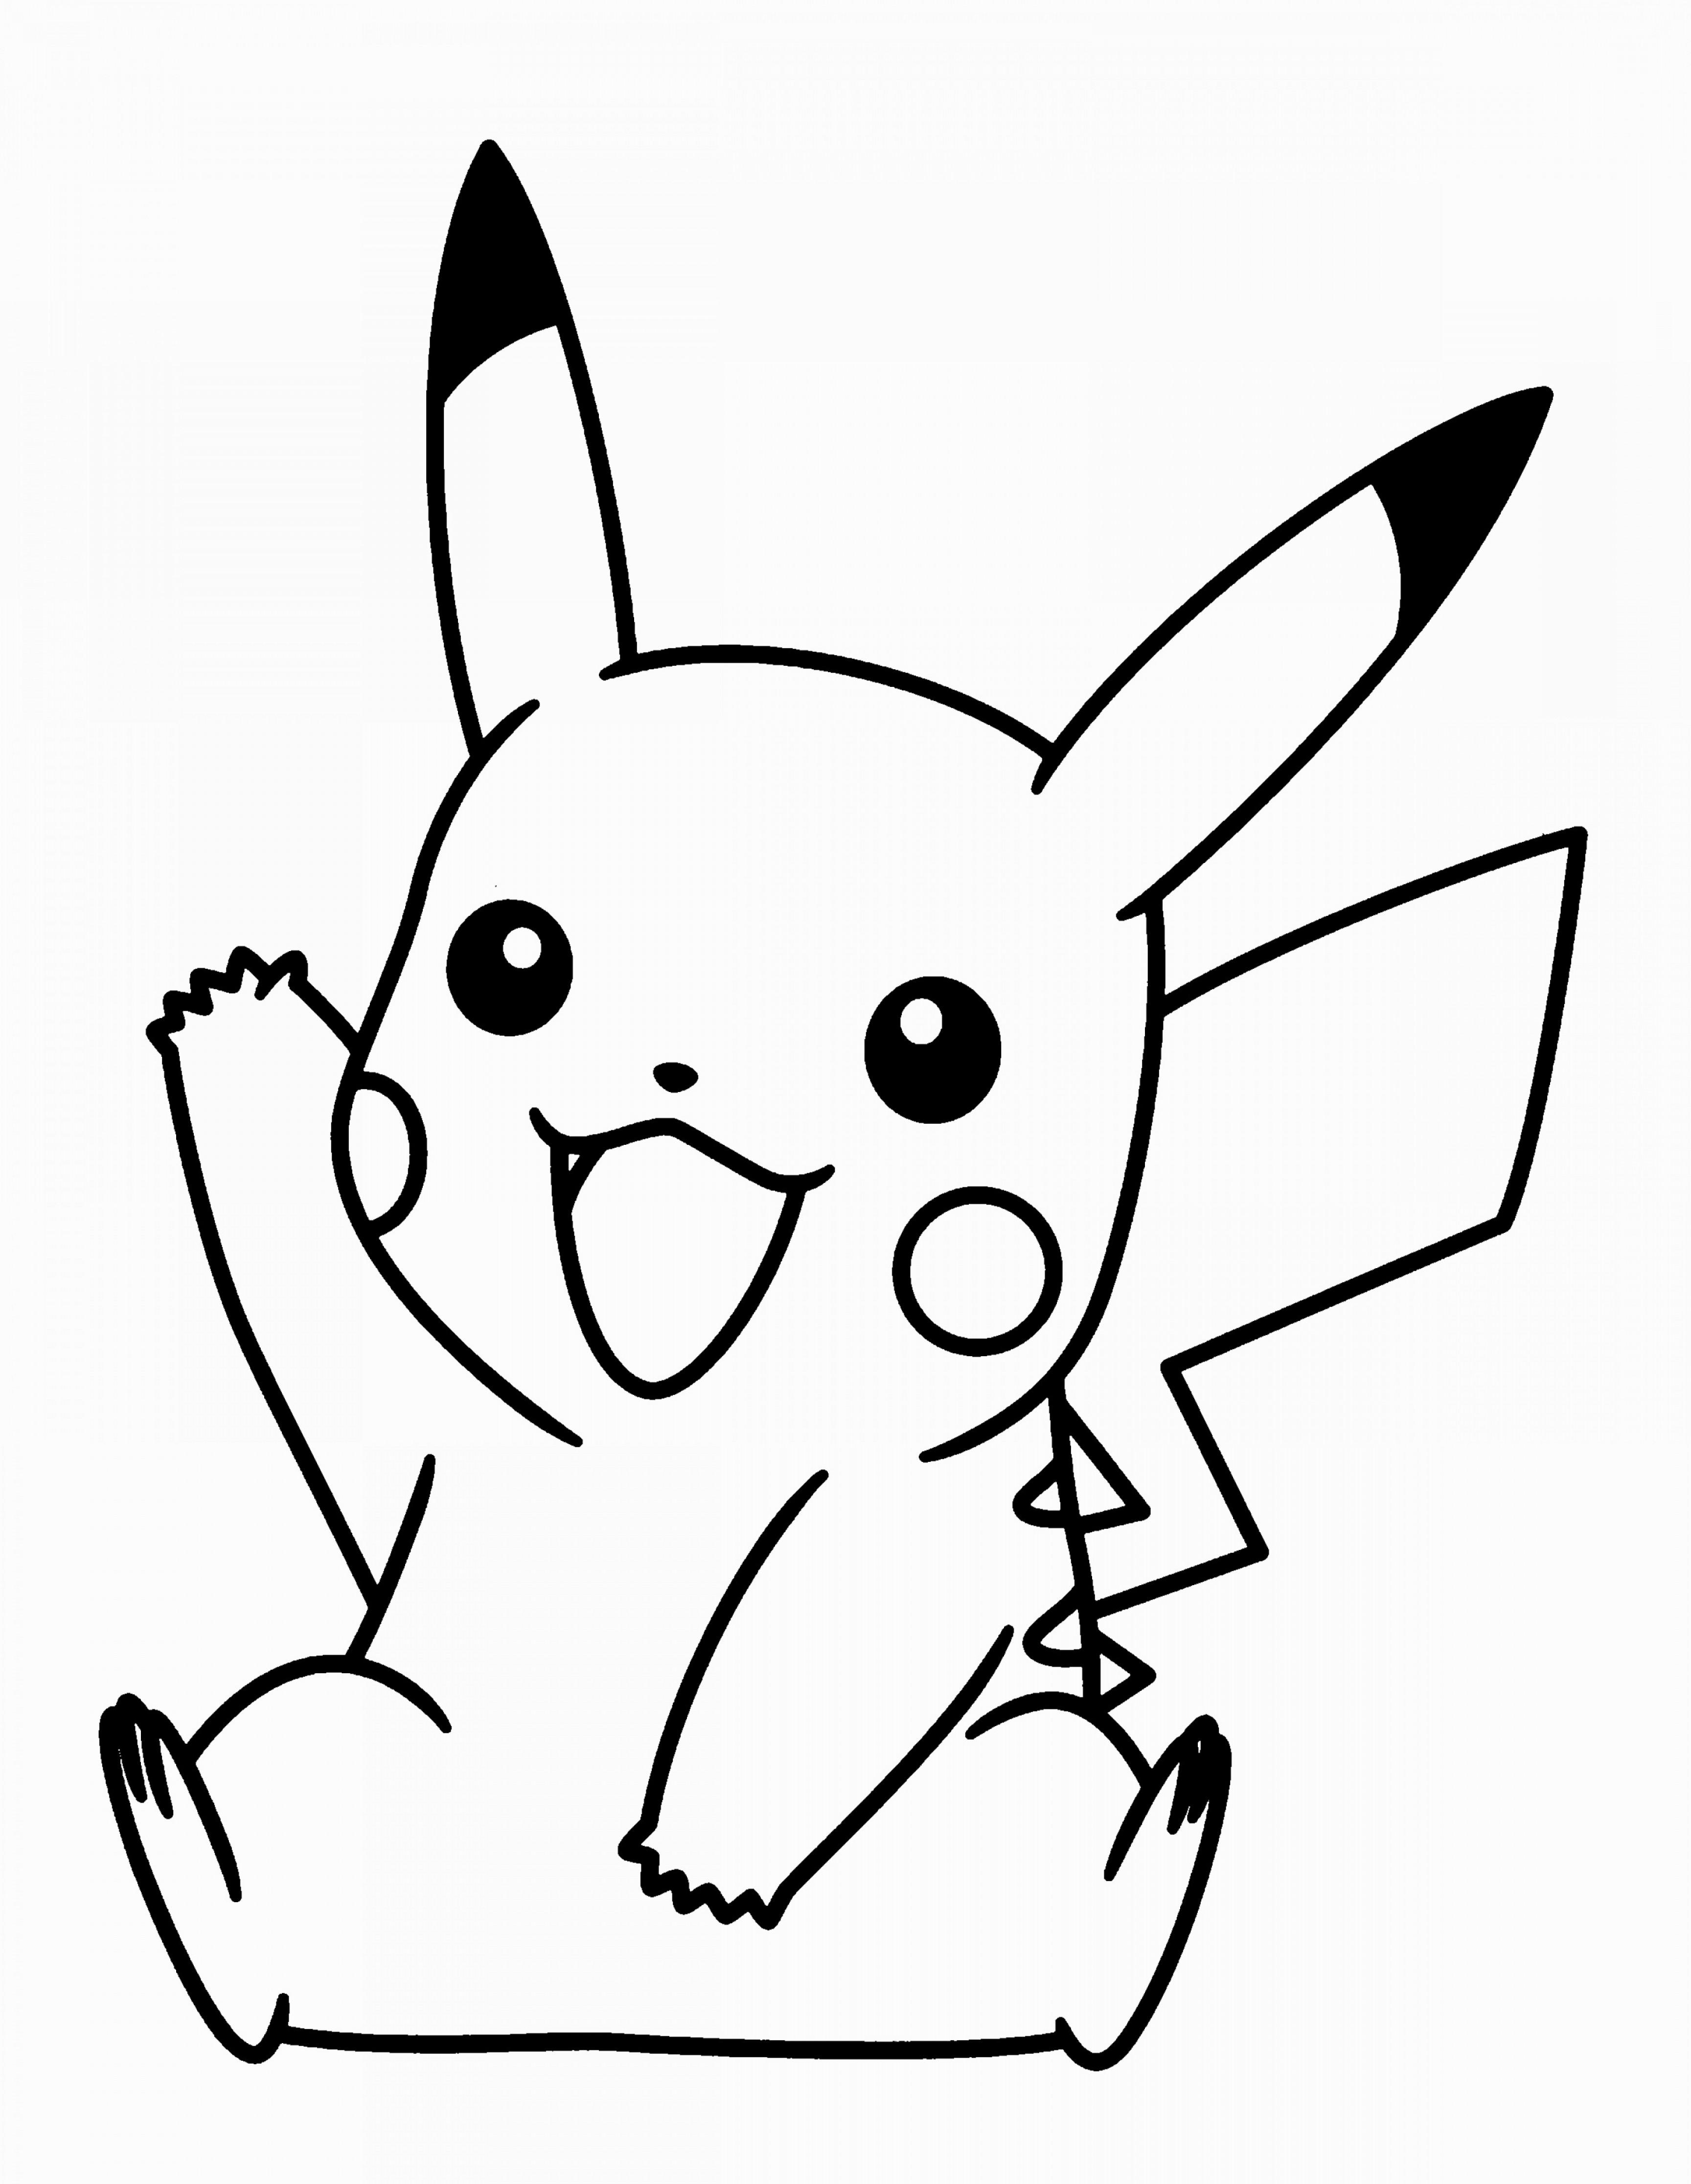 3456x4464 Innovational Ideas Pikachu Outline Free Vector Graphic Pokemon Go